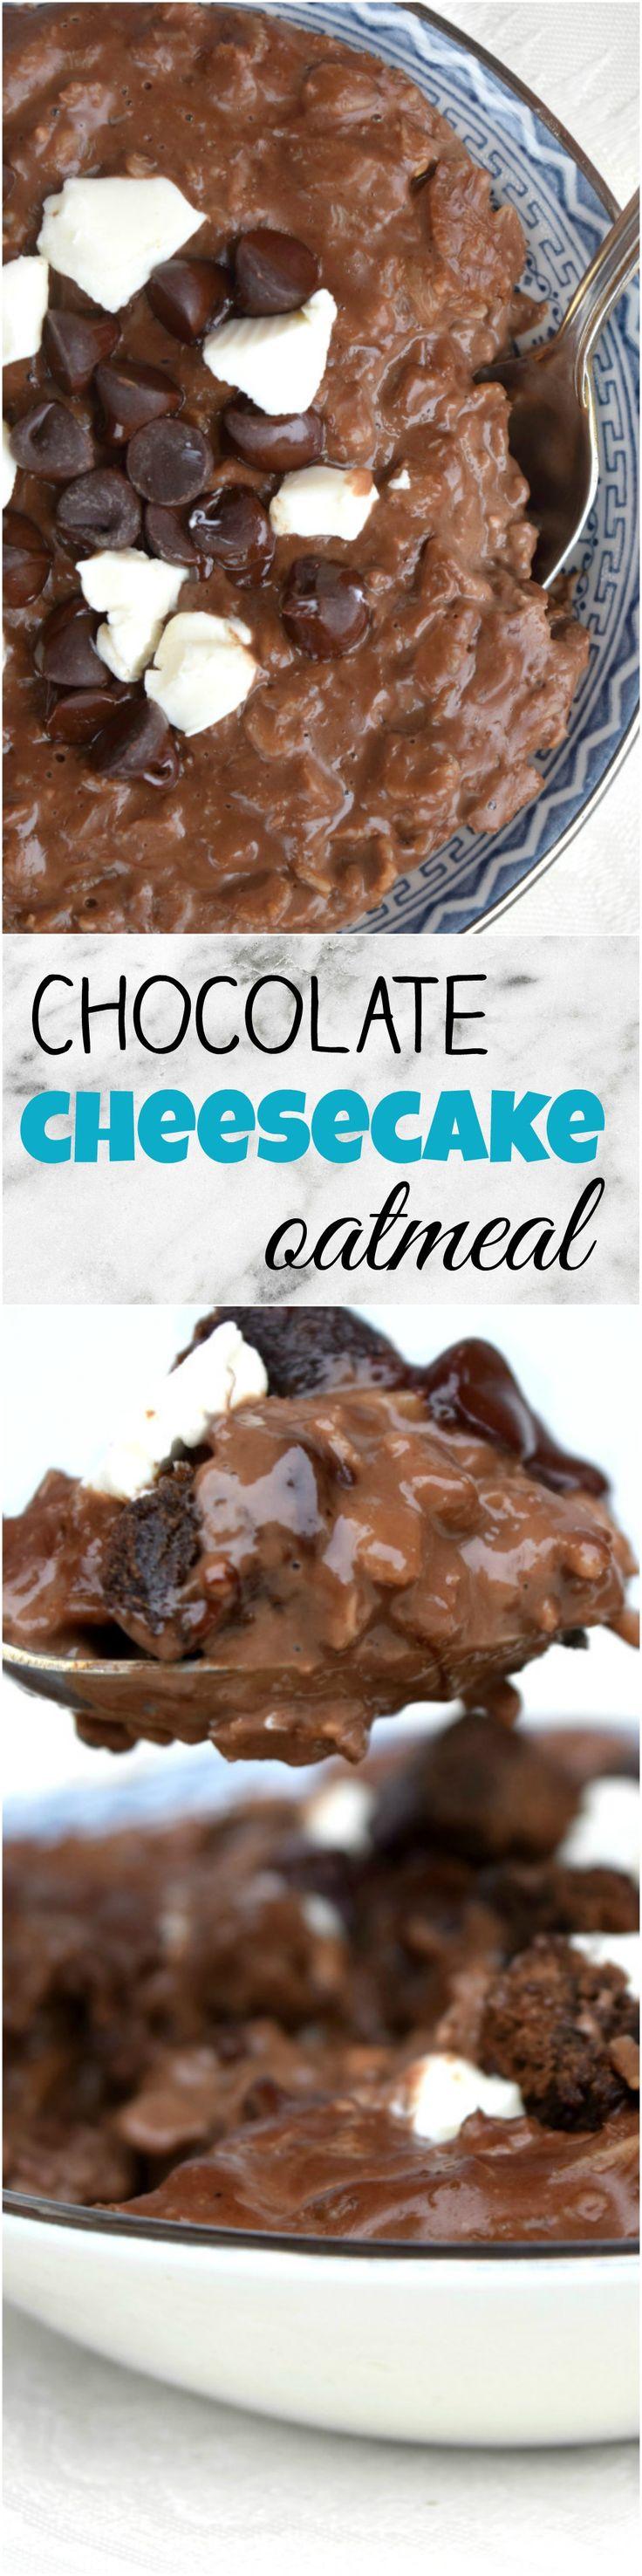 Decadent chocolate cheesecake oatmeal!